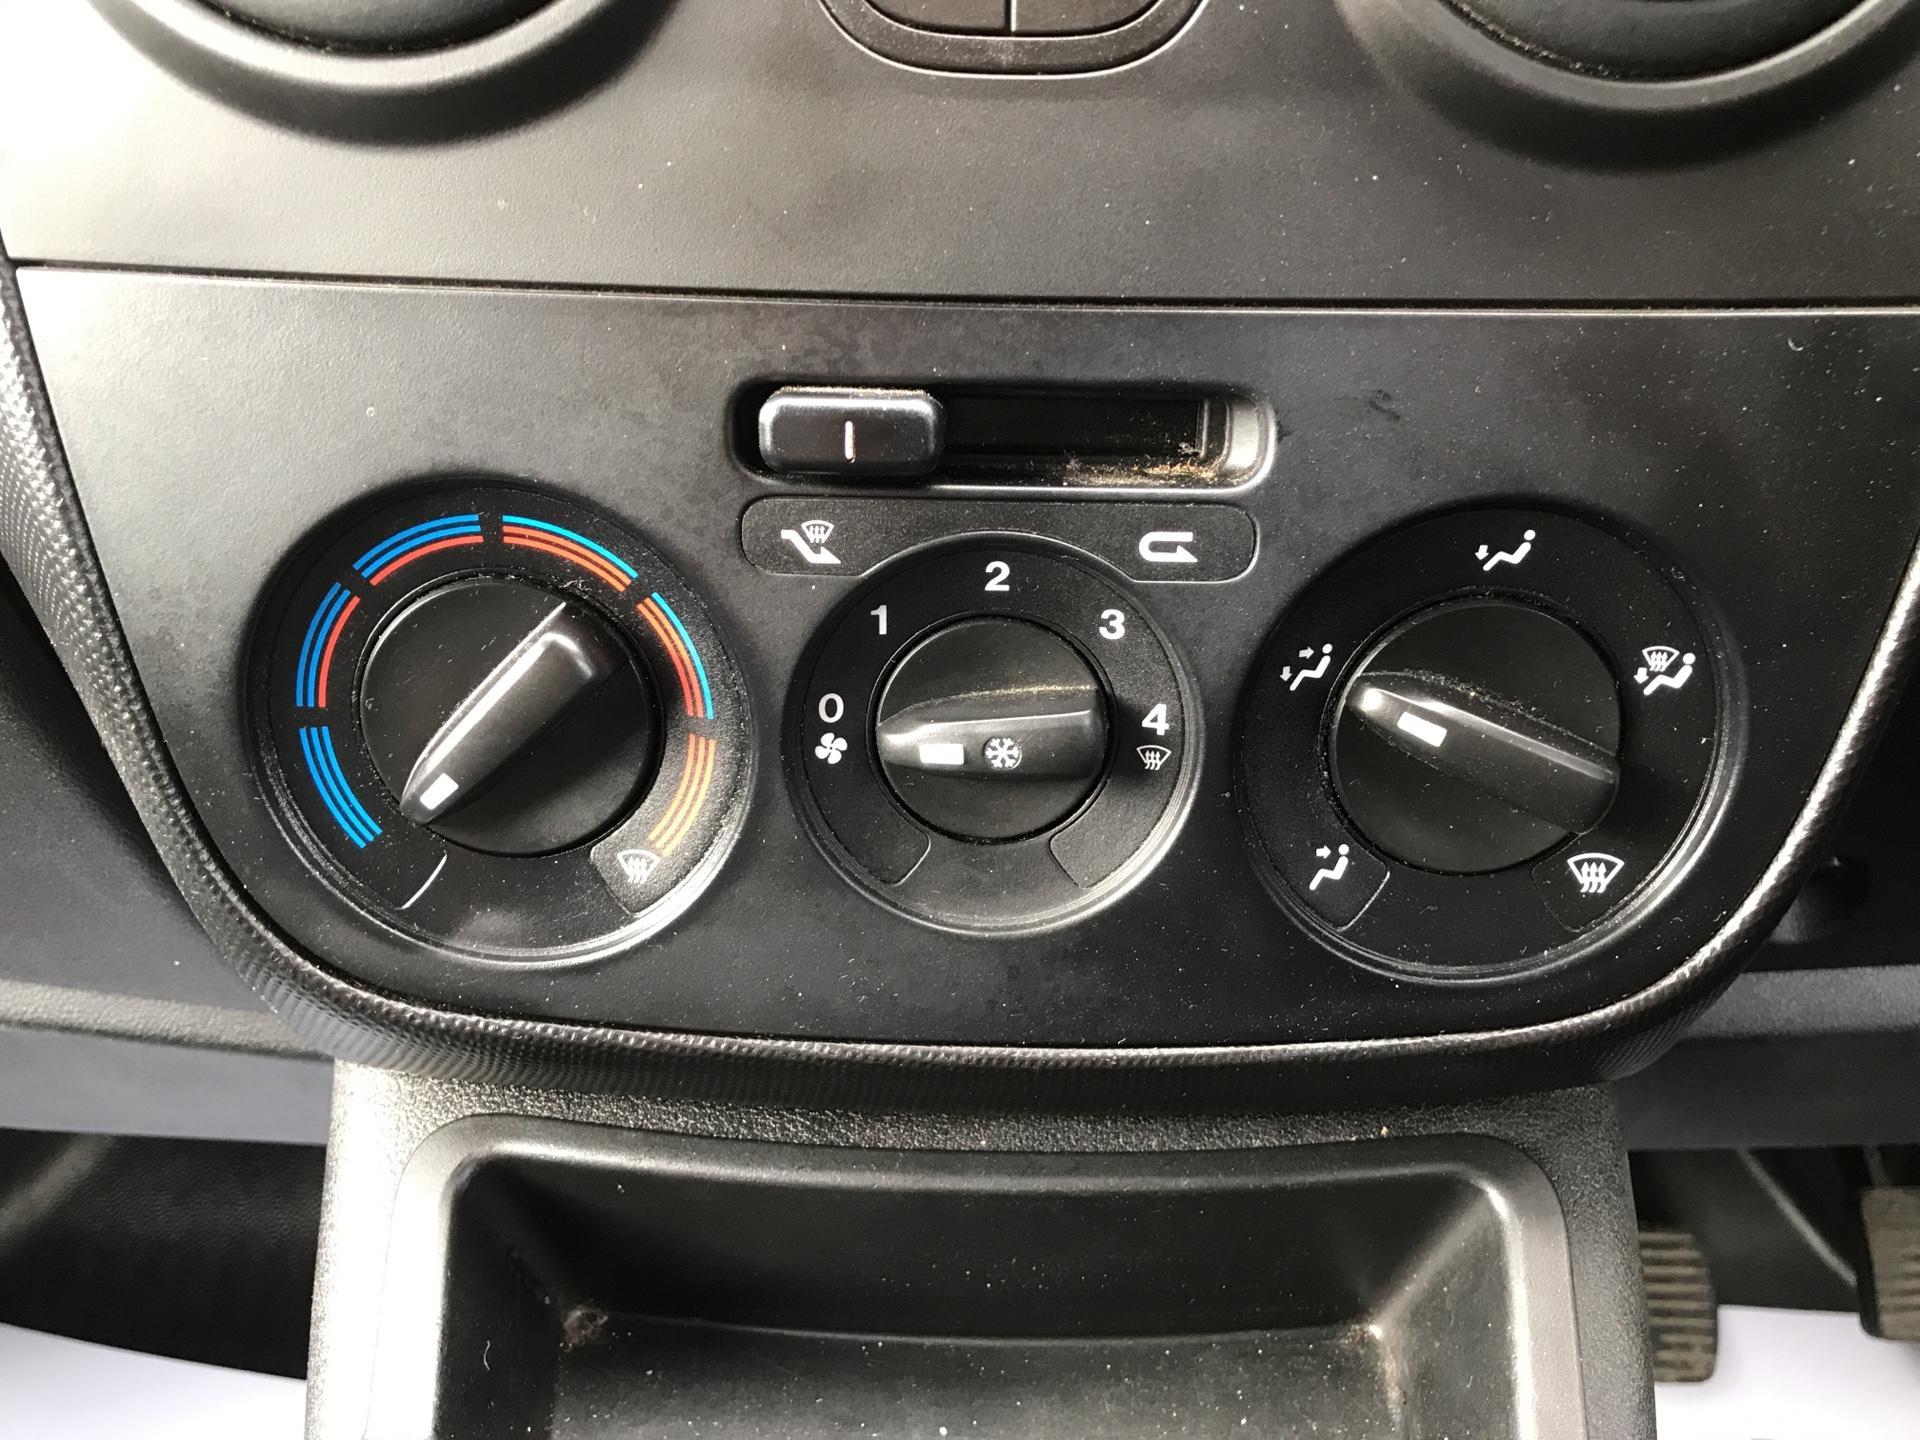 2015 Peugeot Bipper 1.3 Hdi 75 Professional [Non Start/Stop] (BG15DTN) Image 25